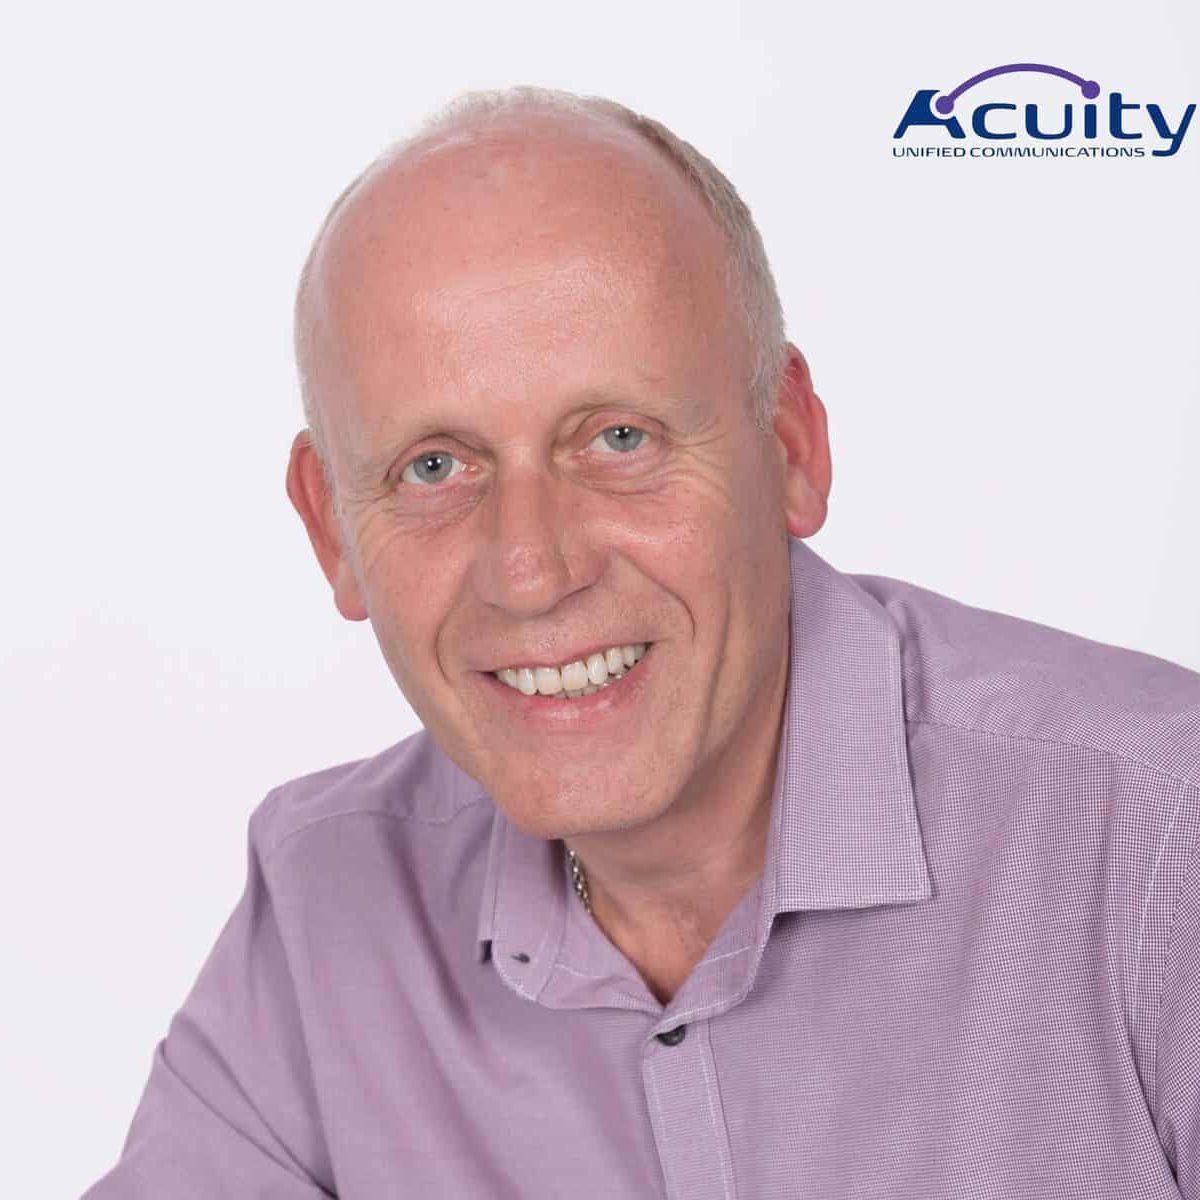 Acuity John Dowbiggin - small